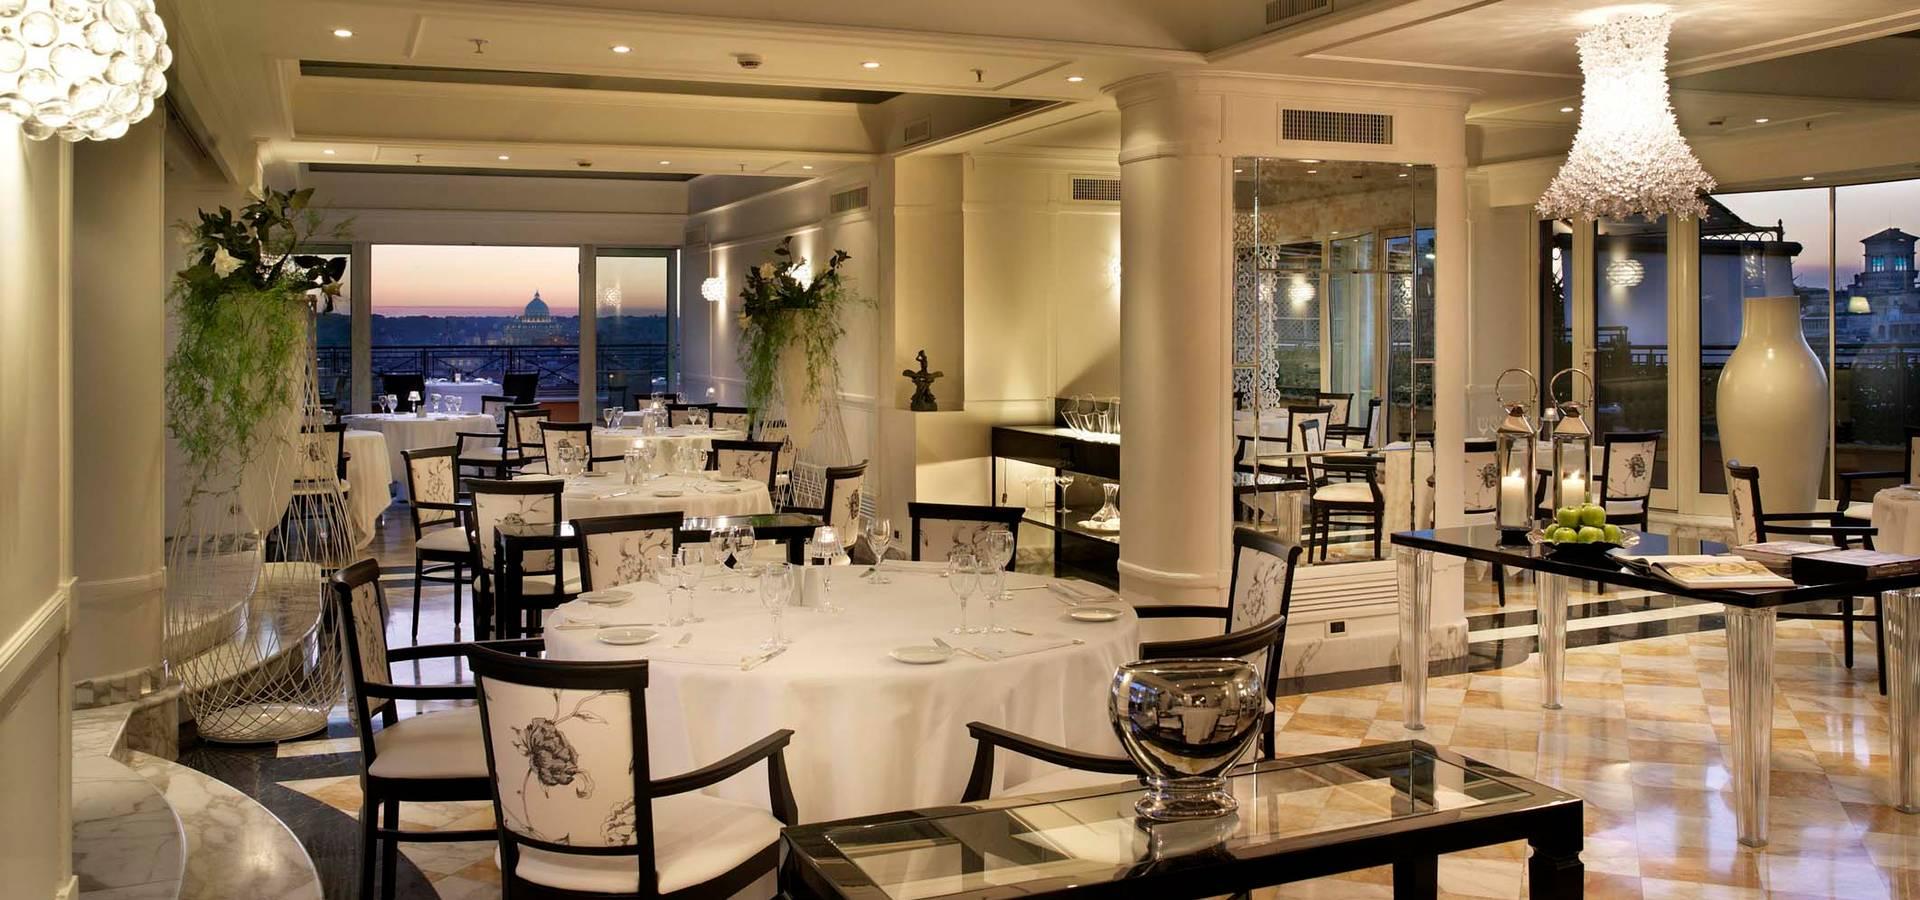 Giada Marchese-architetto & hospitality designer